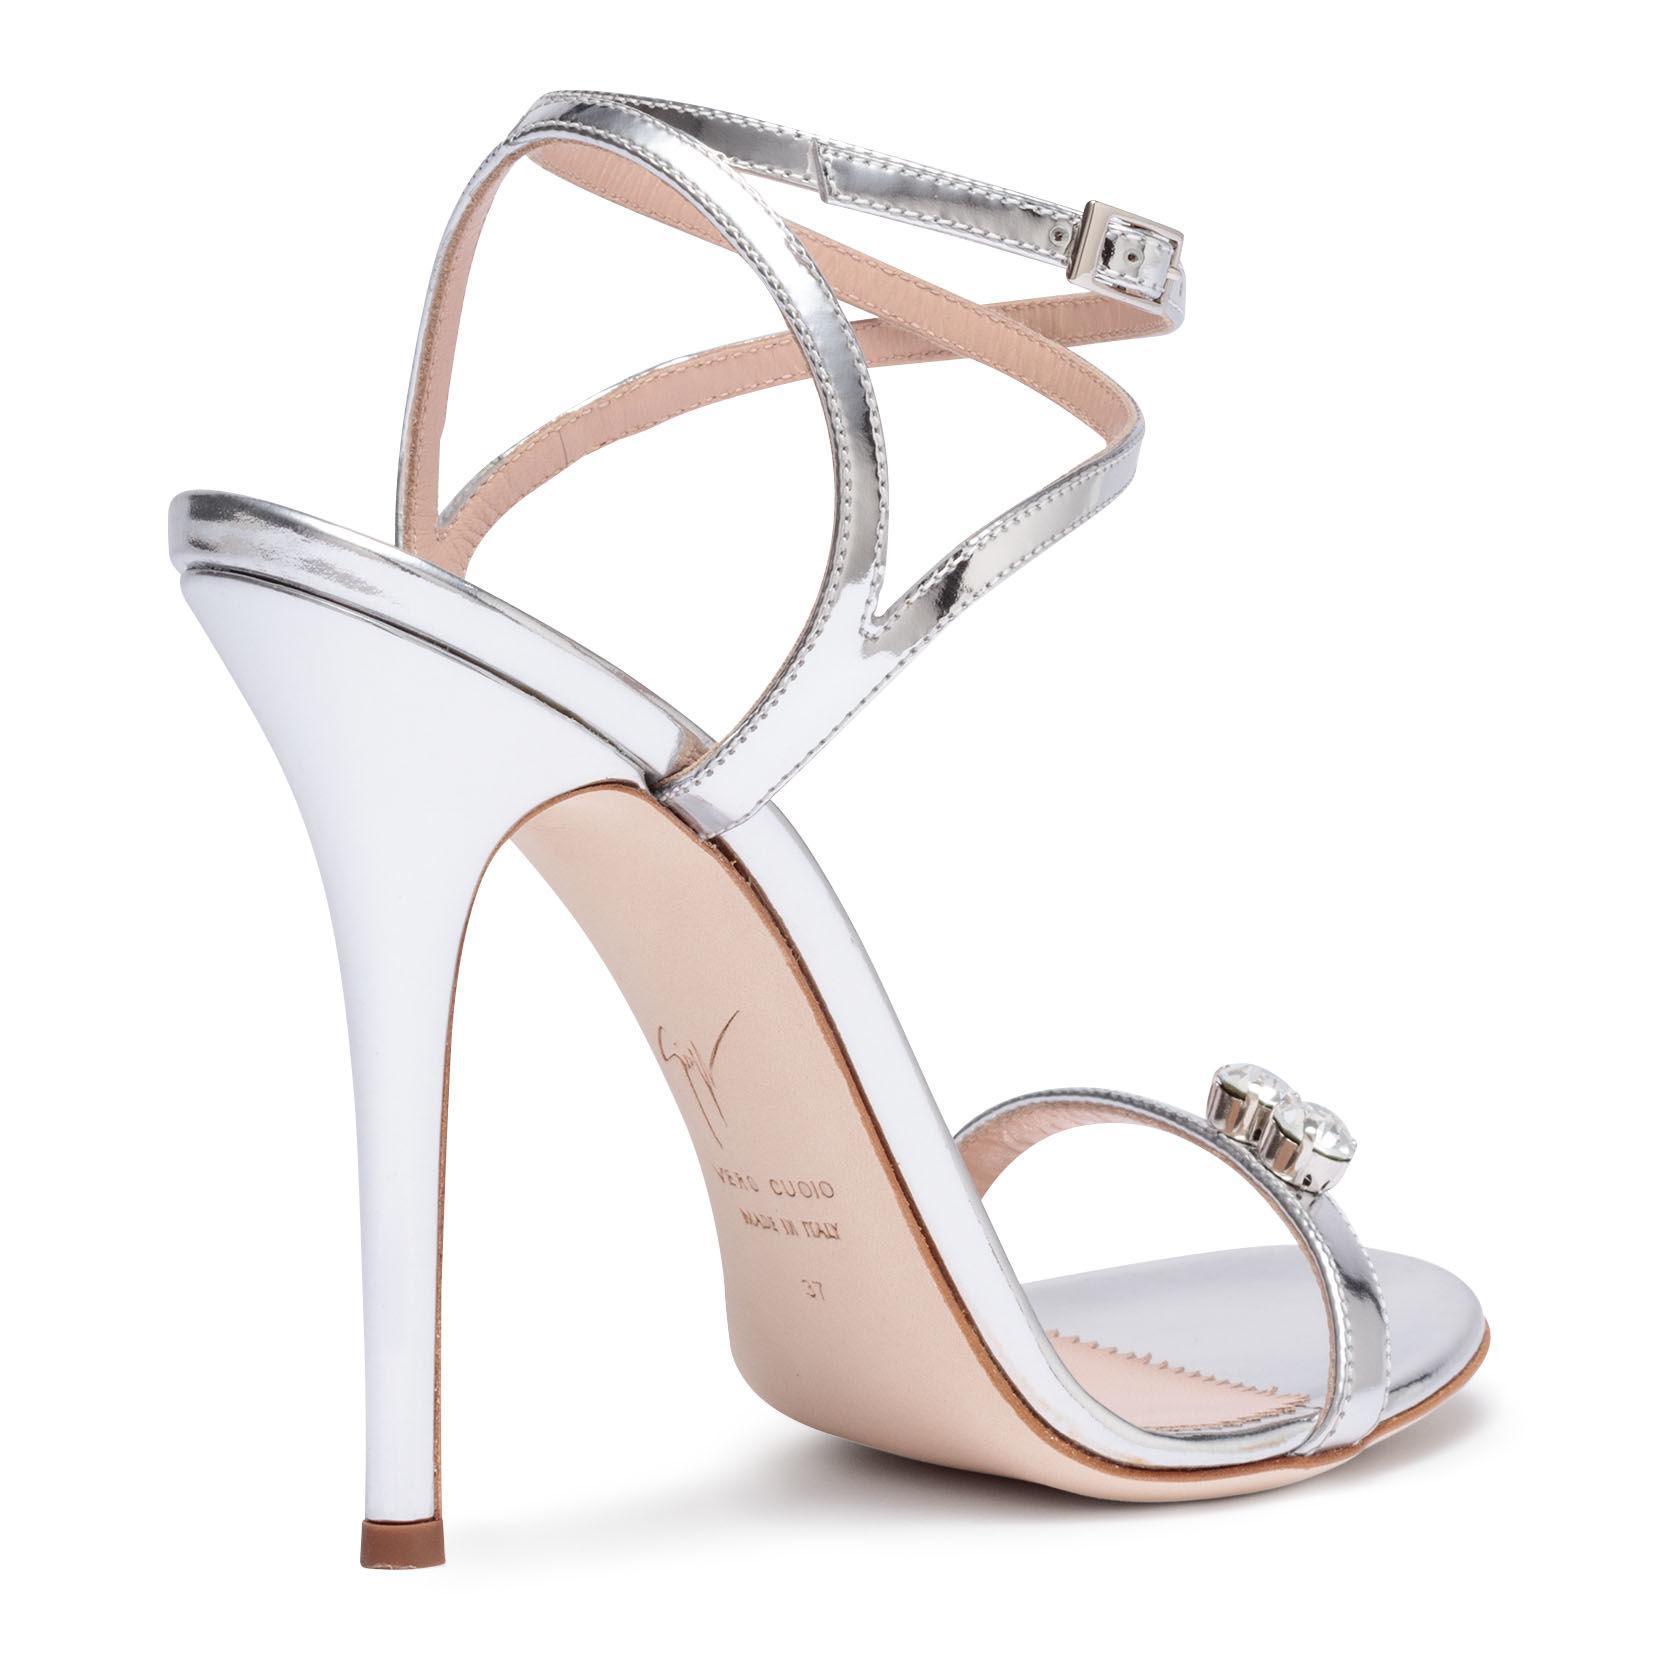 1d00bfa3ca8 Lyst - Giuseppe Zanotti Ellie Metallic Silver Leather Sandals in ...